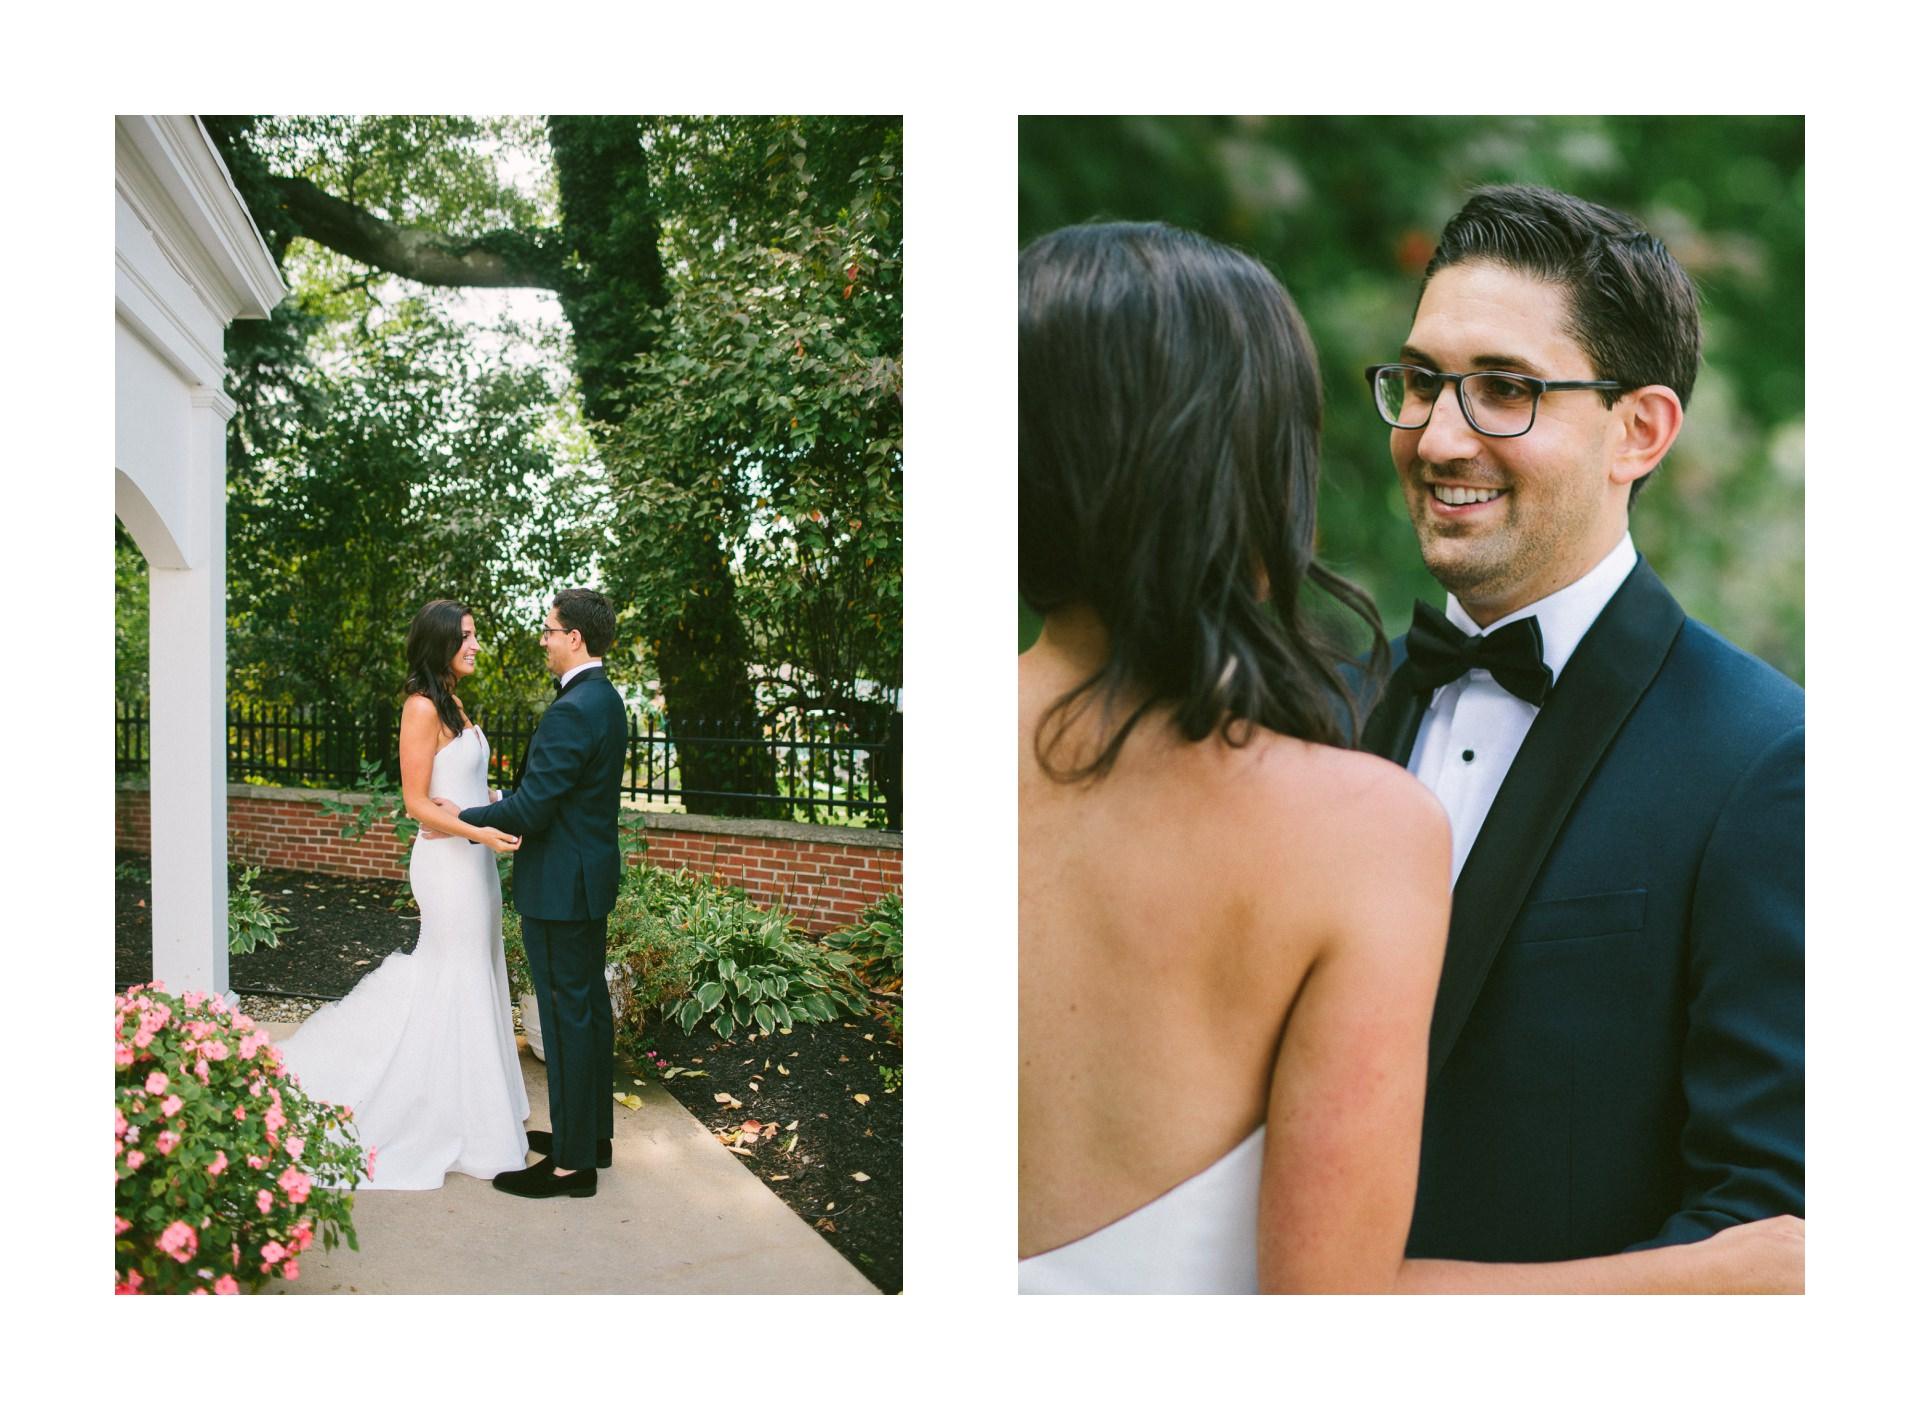 Beechmont Country Club Wedding Photographer in Beachwood 1 29.jpg